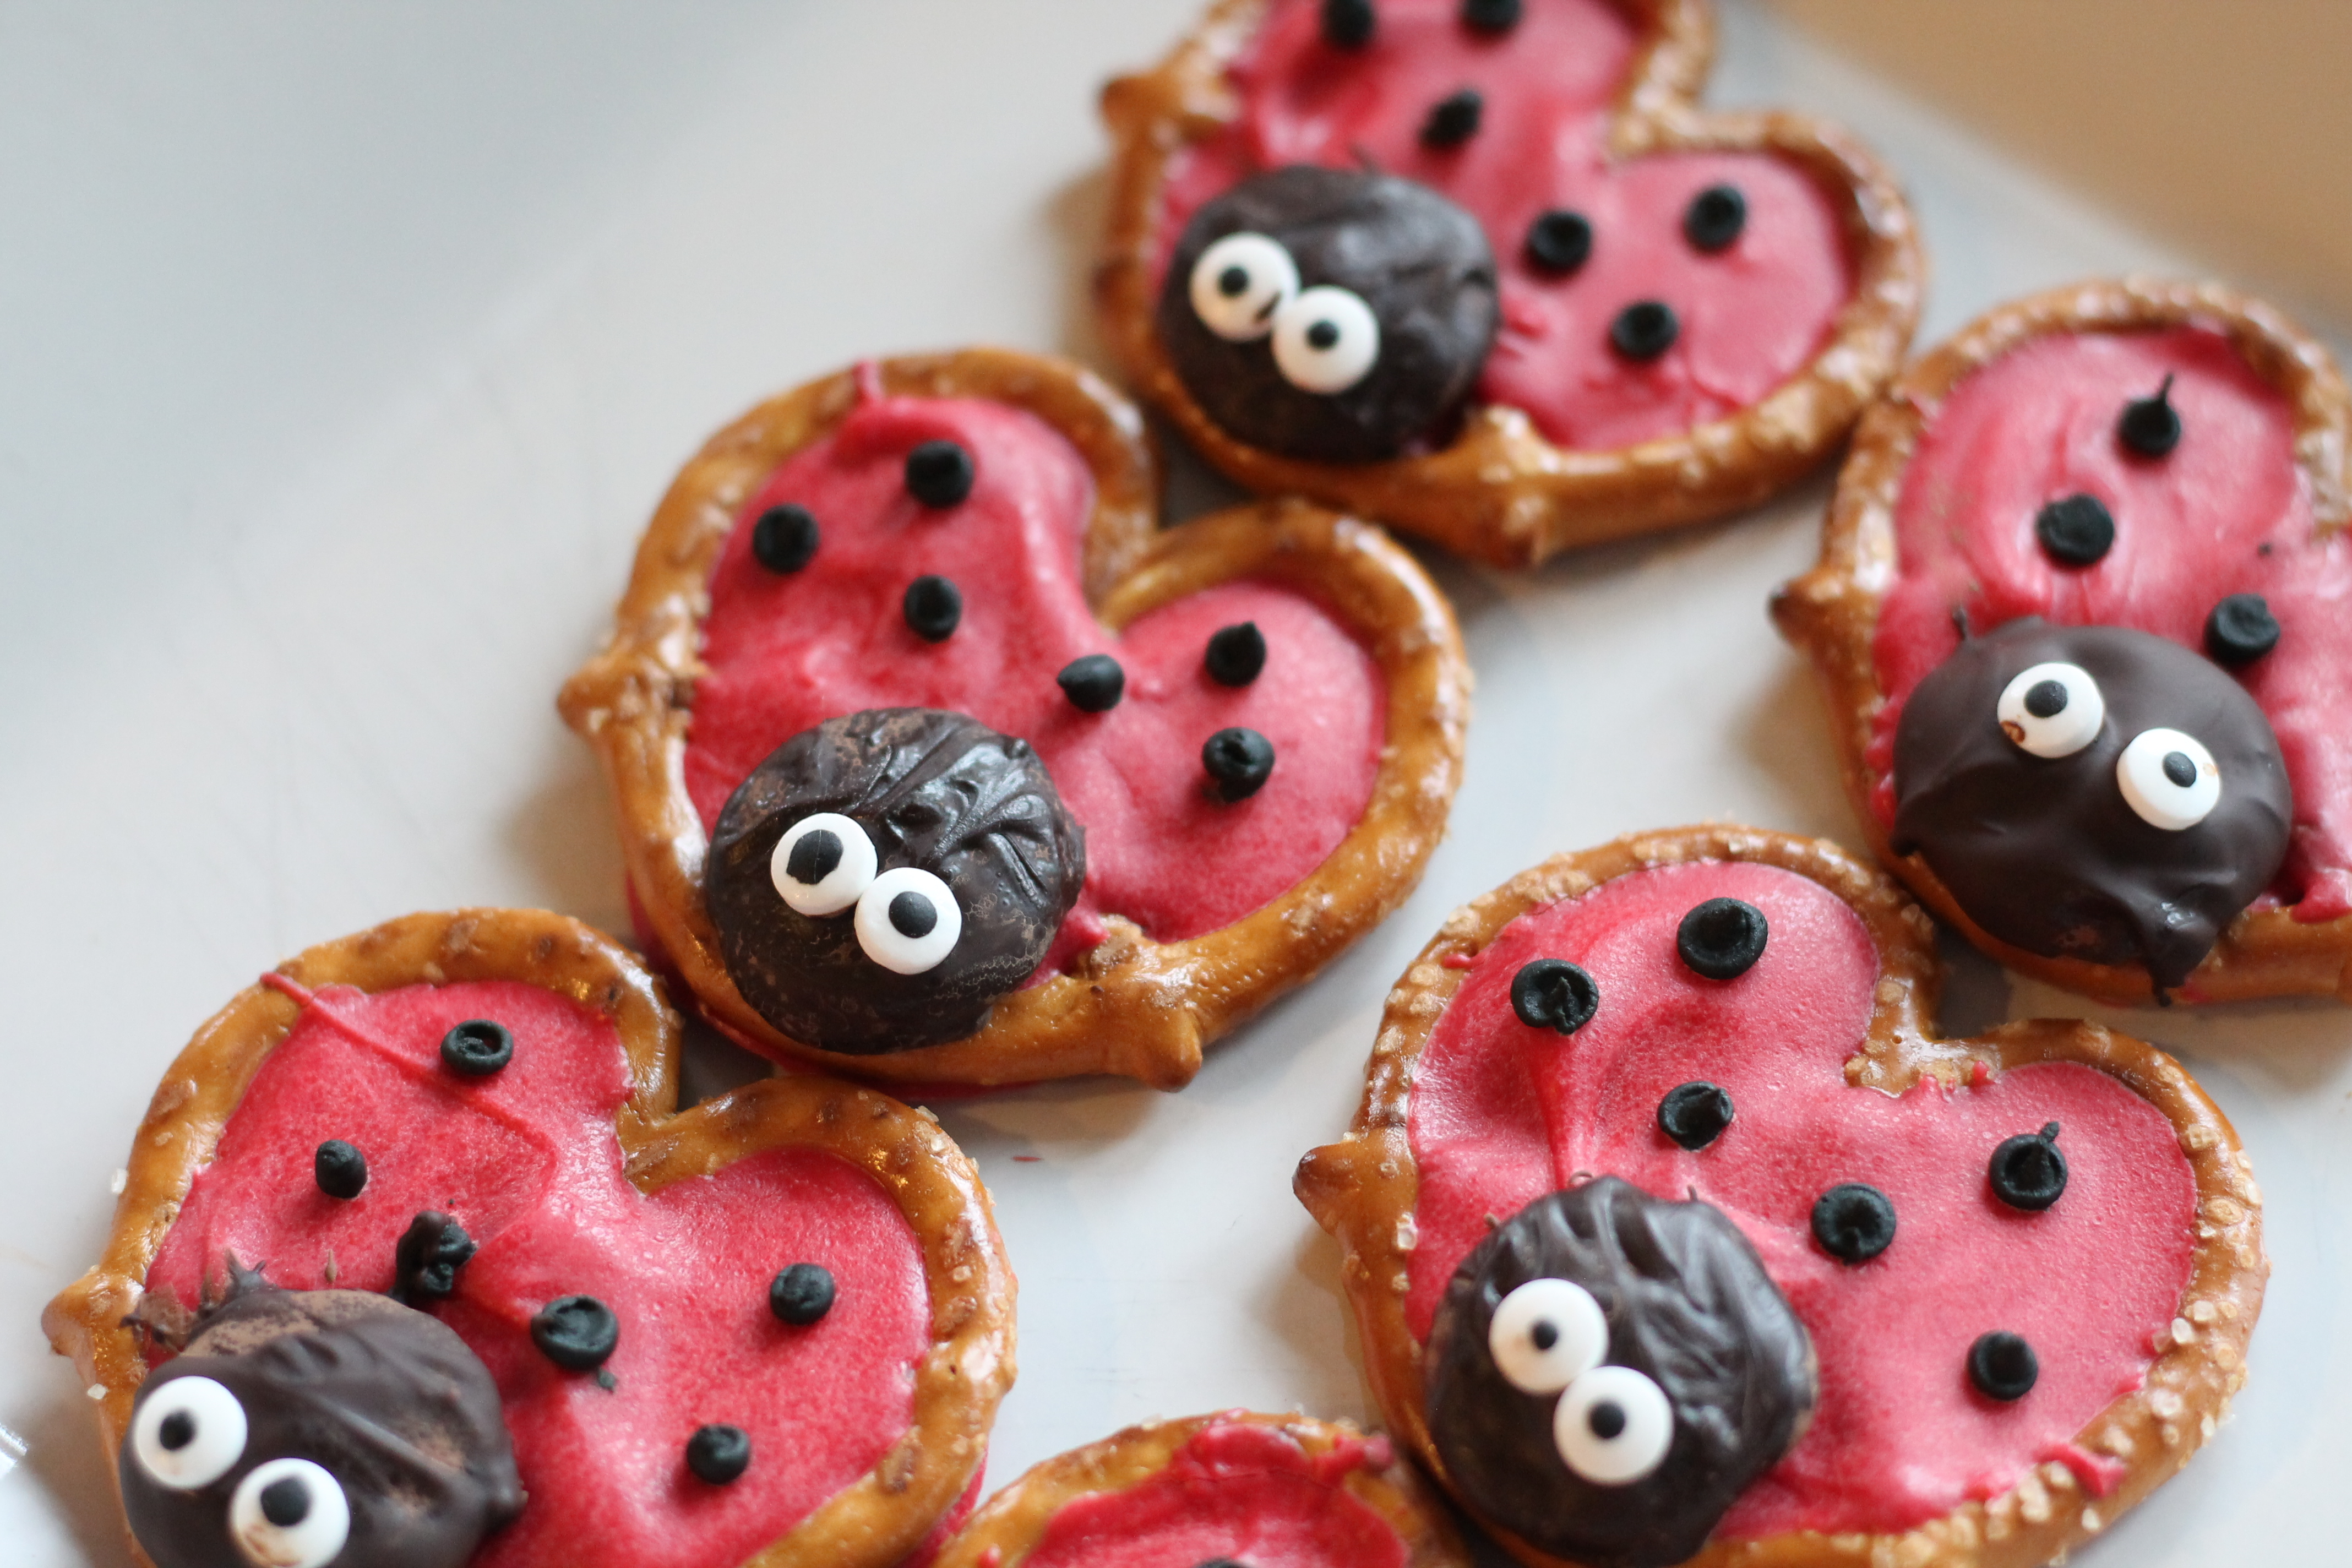 Ladybug party snacks